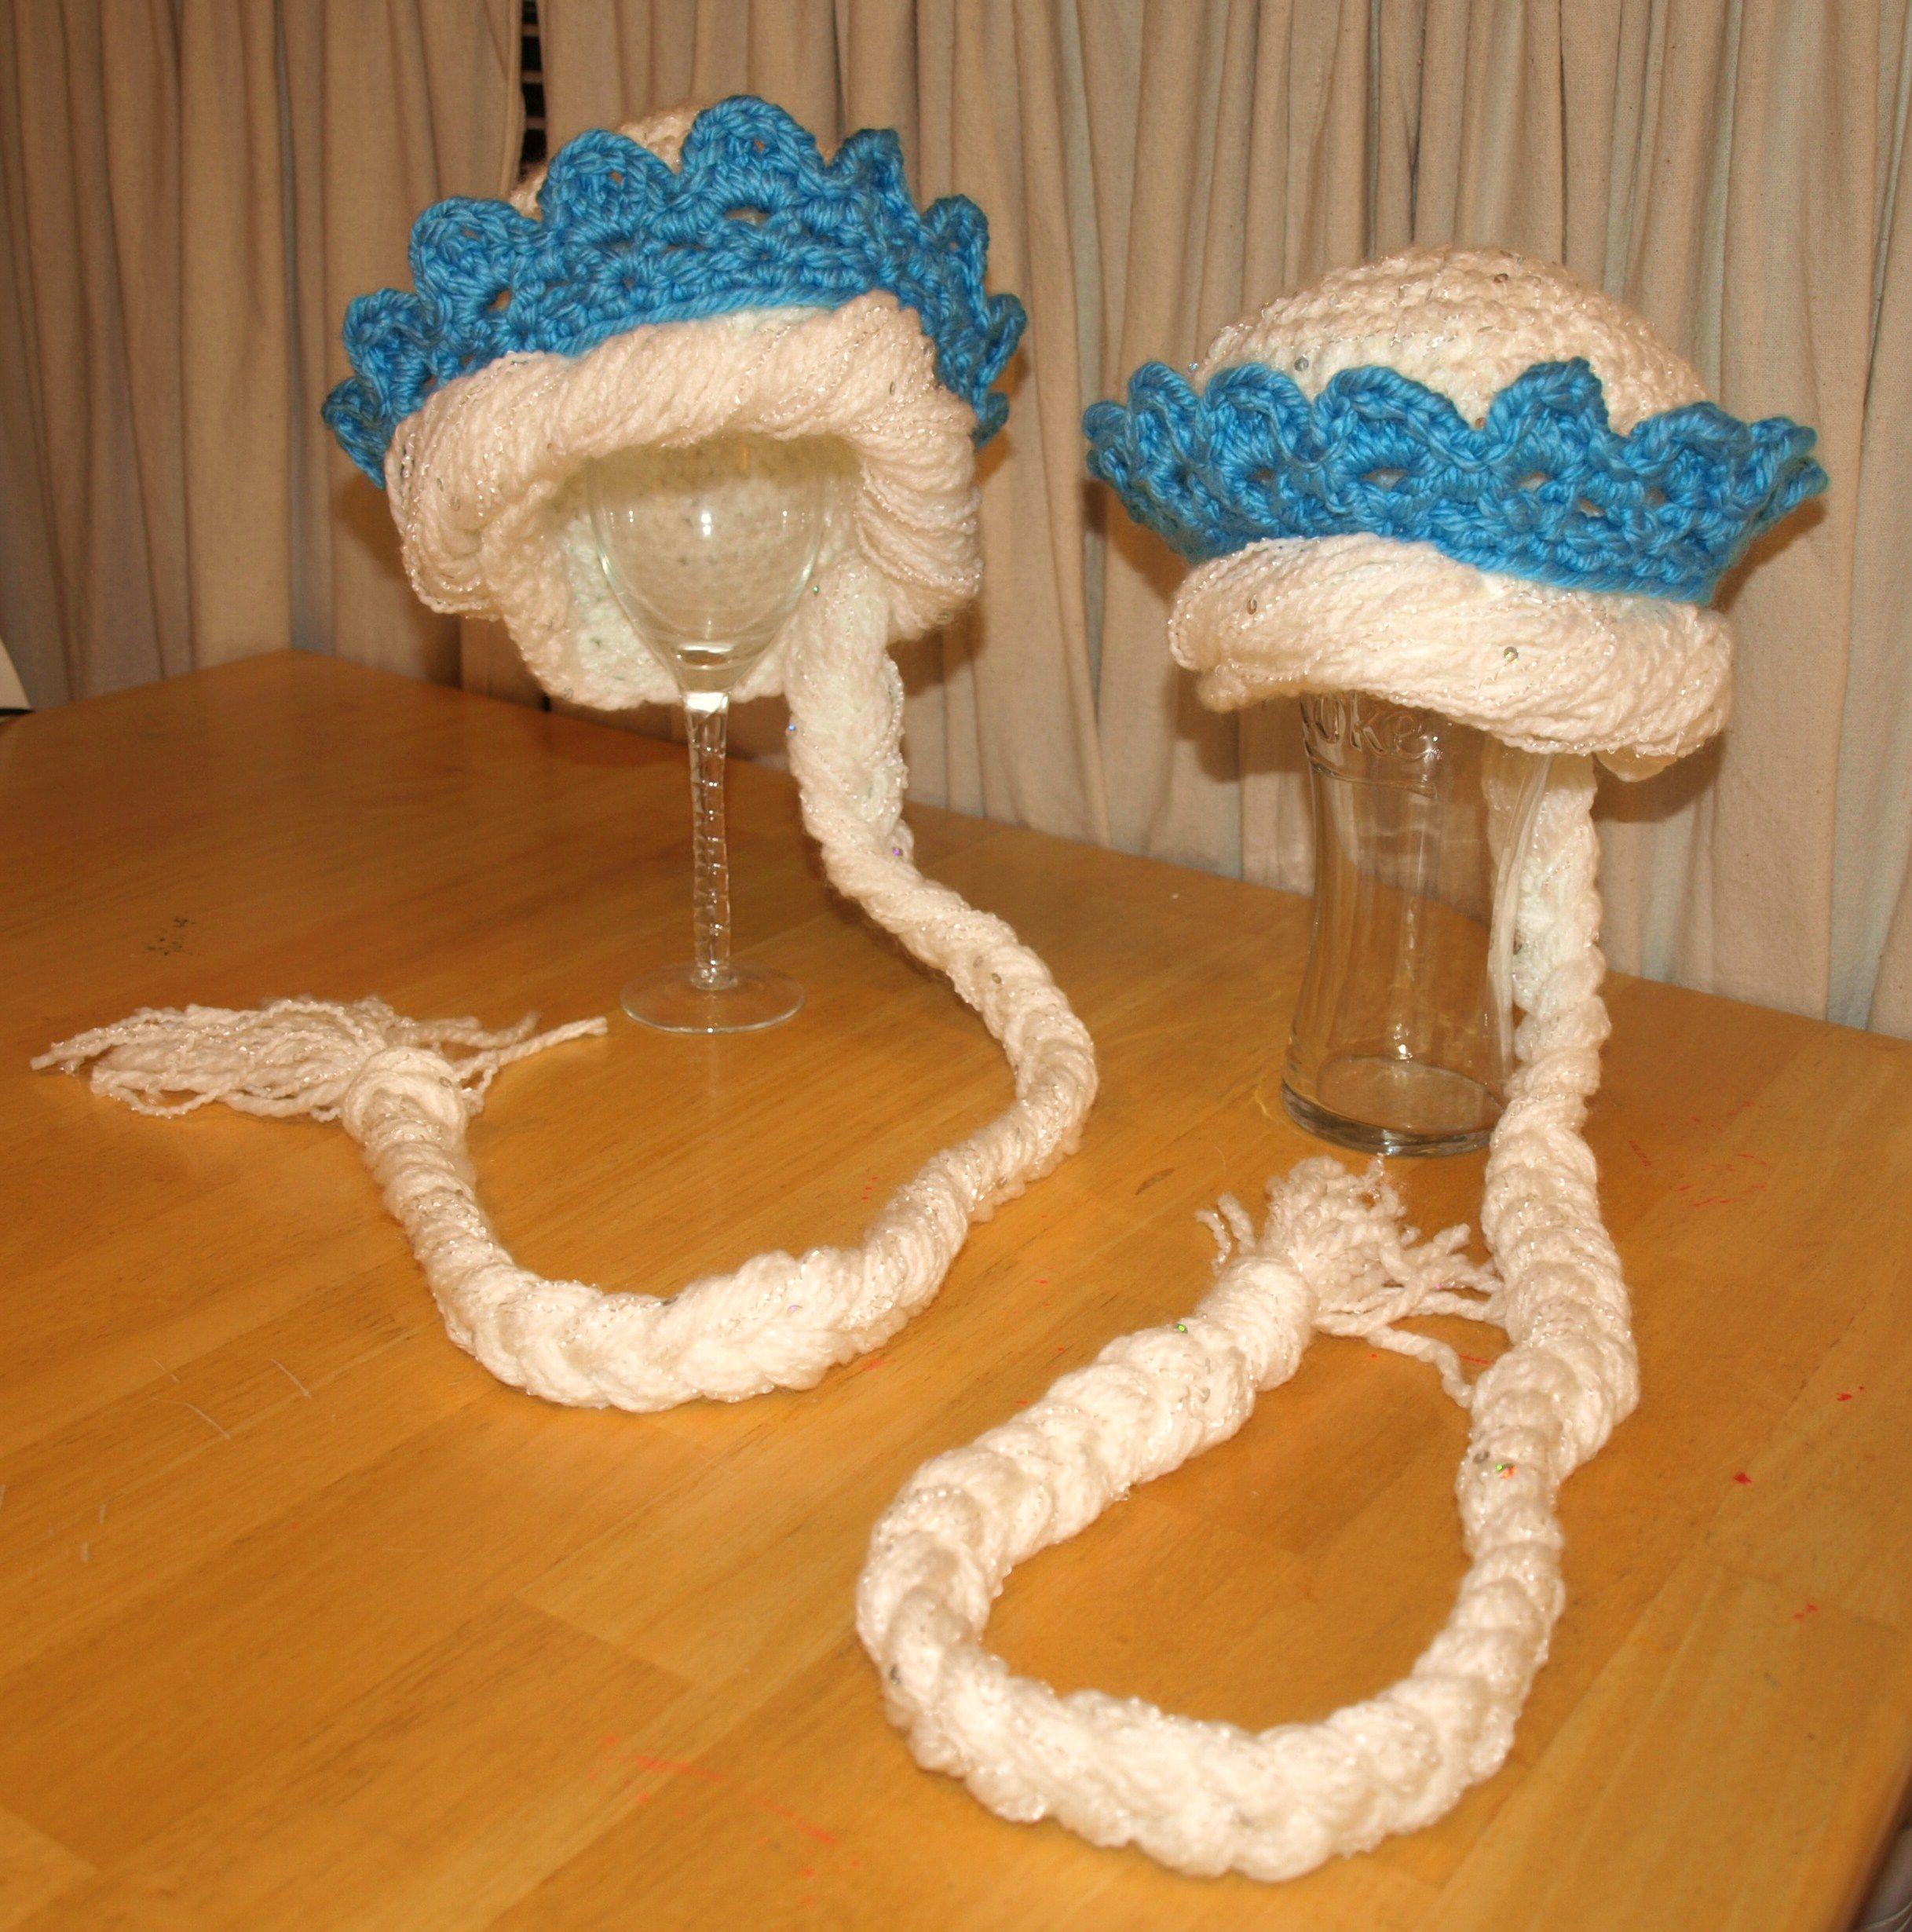 Elsa crocheted crochet hats